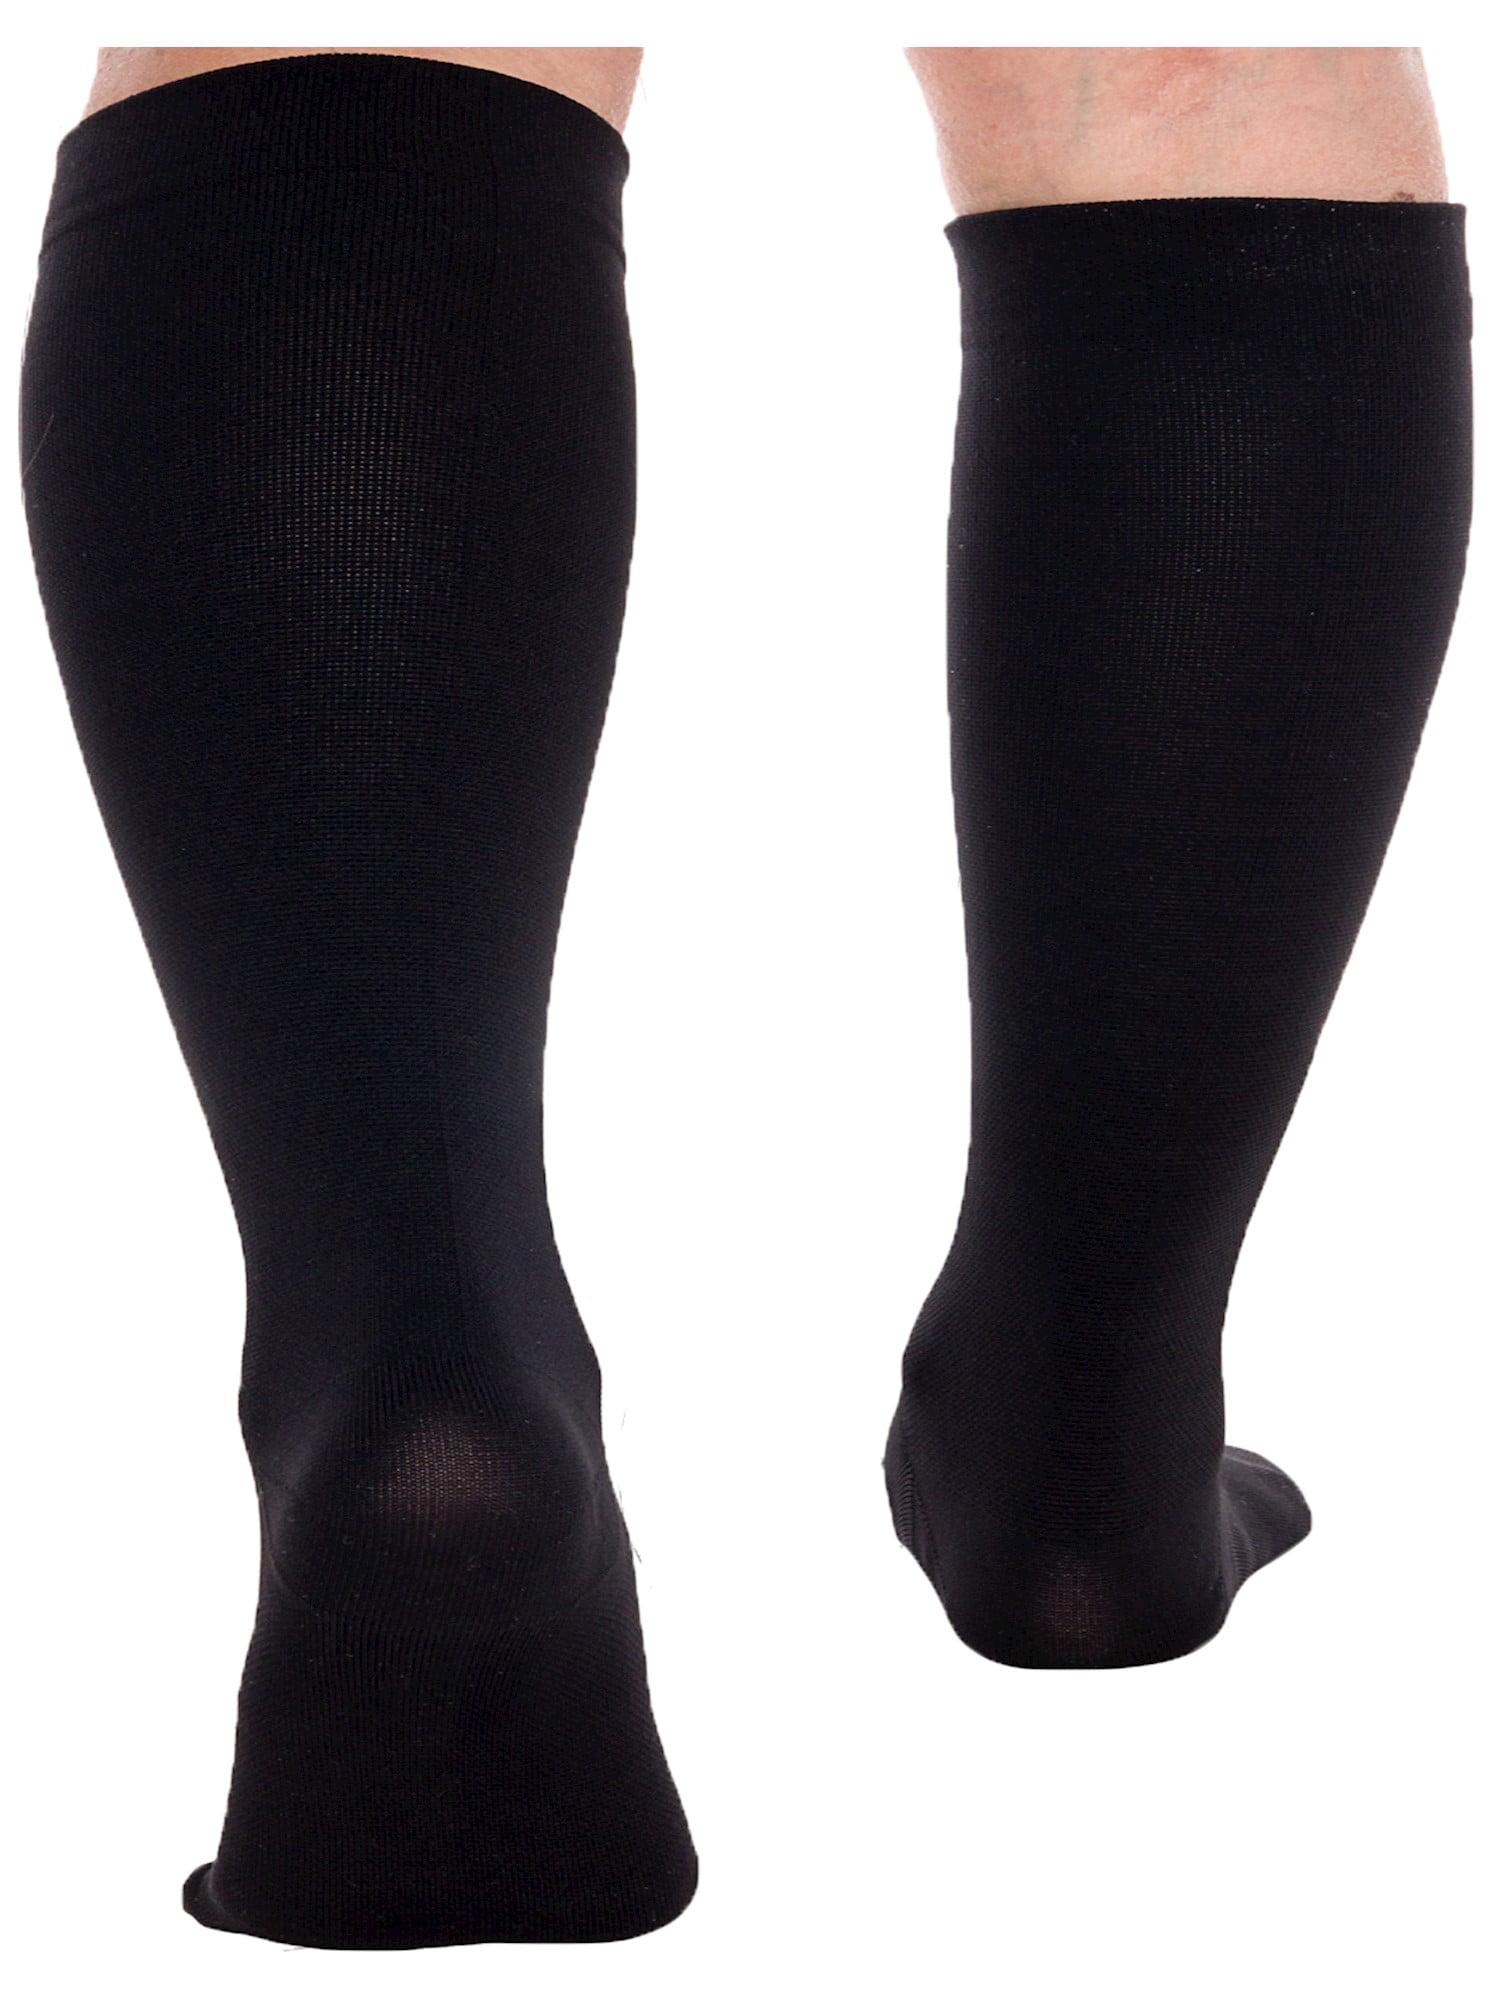 15-25 mmHg Knee High Plus Size Support LISH 2 Pack Plain Jane Wide Calf Compression Socks